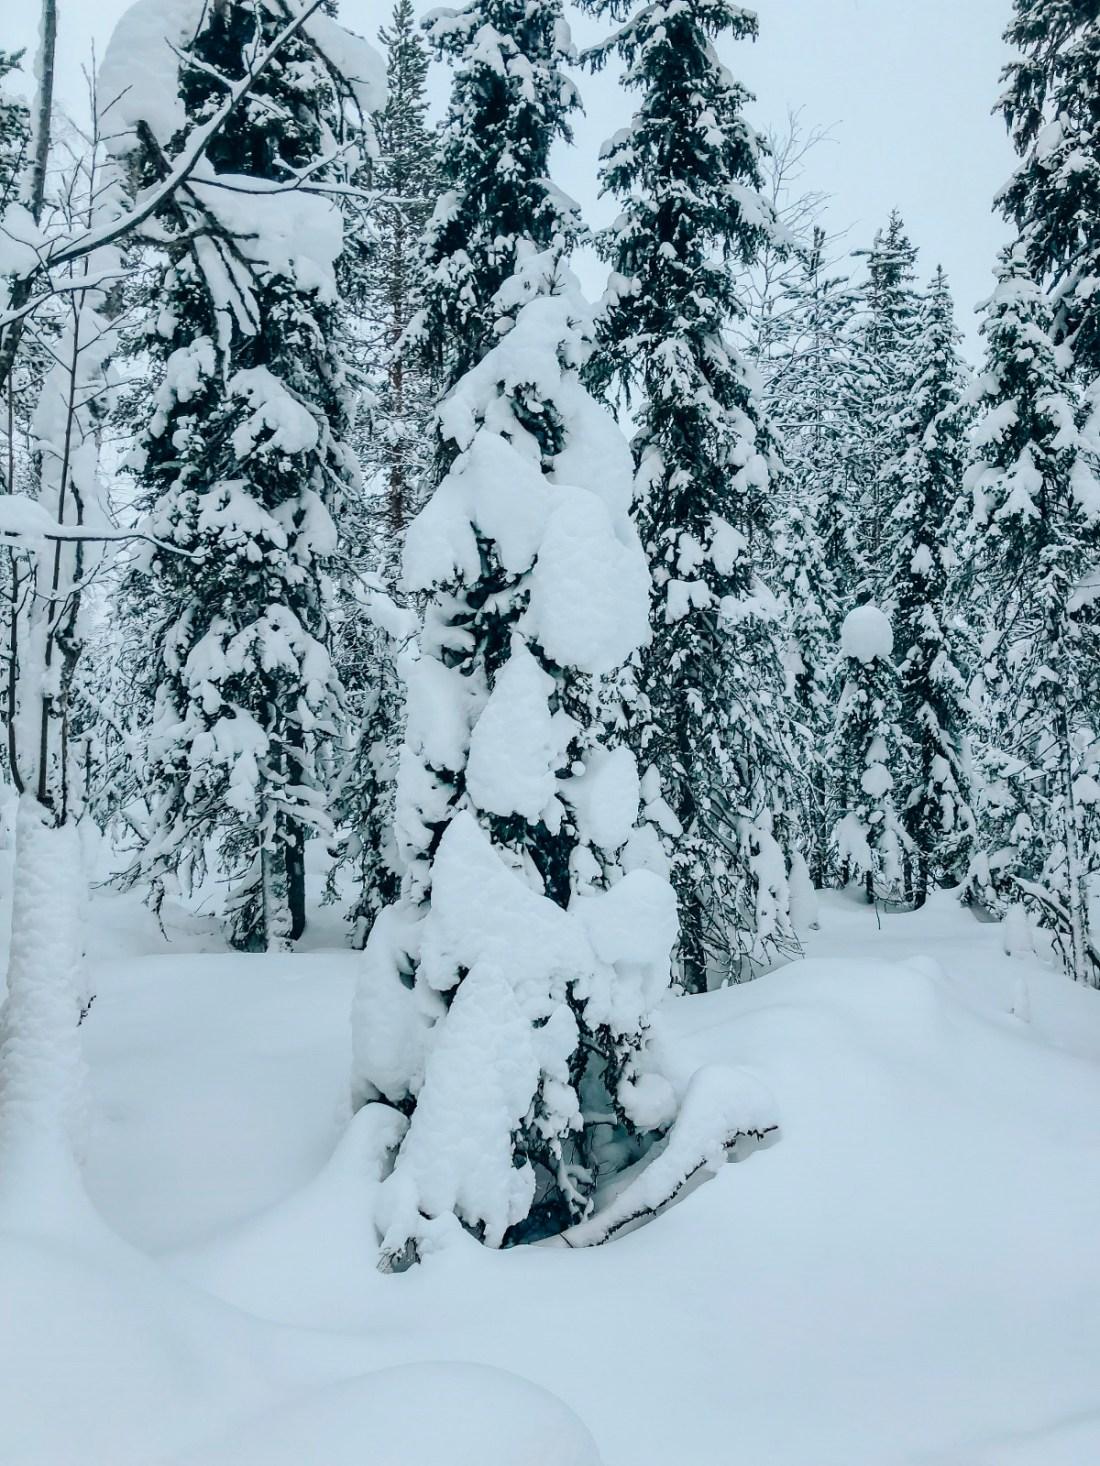 Snowy Trees Finnish lapland